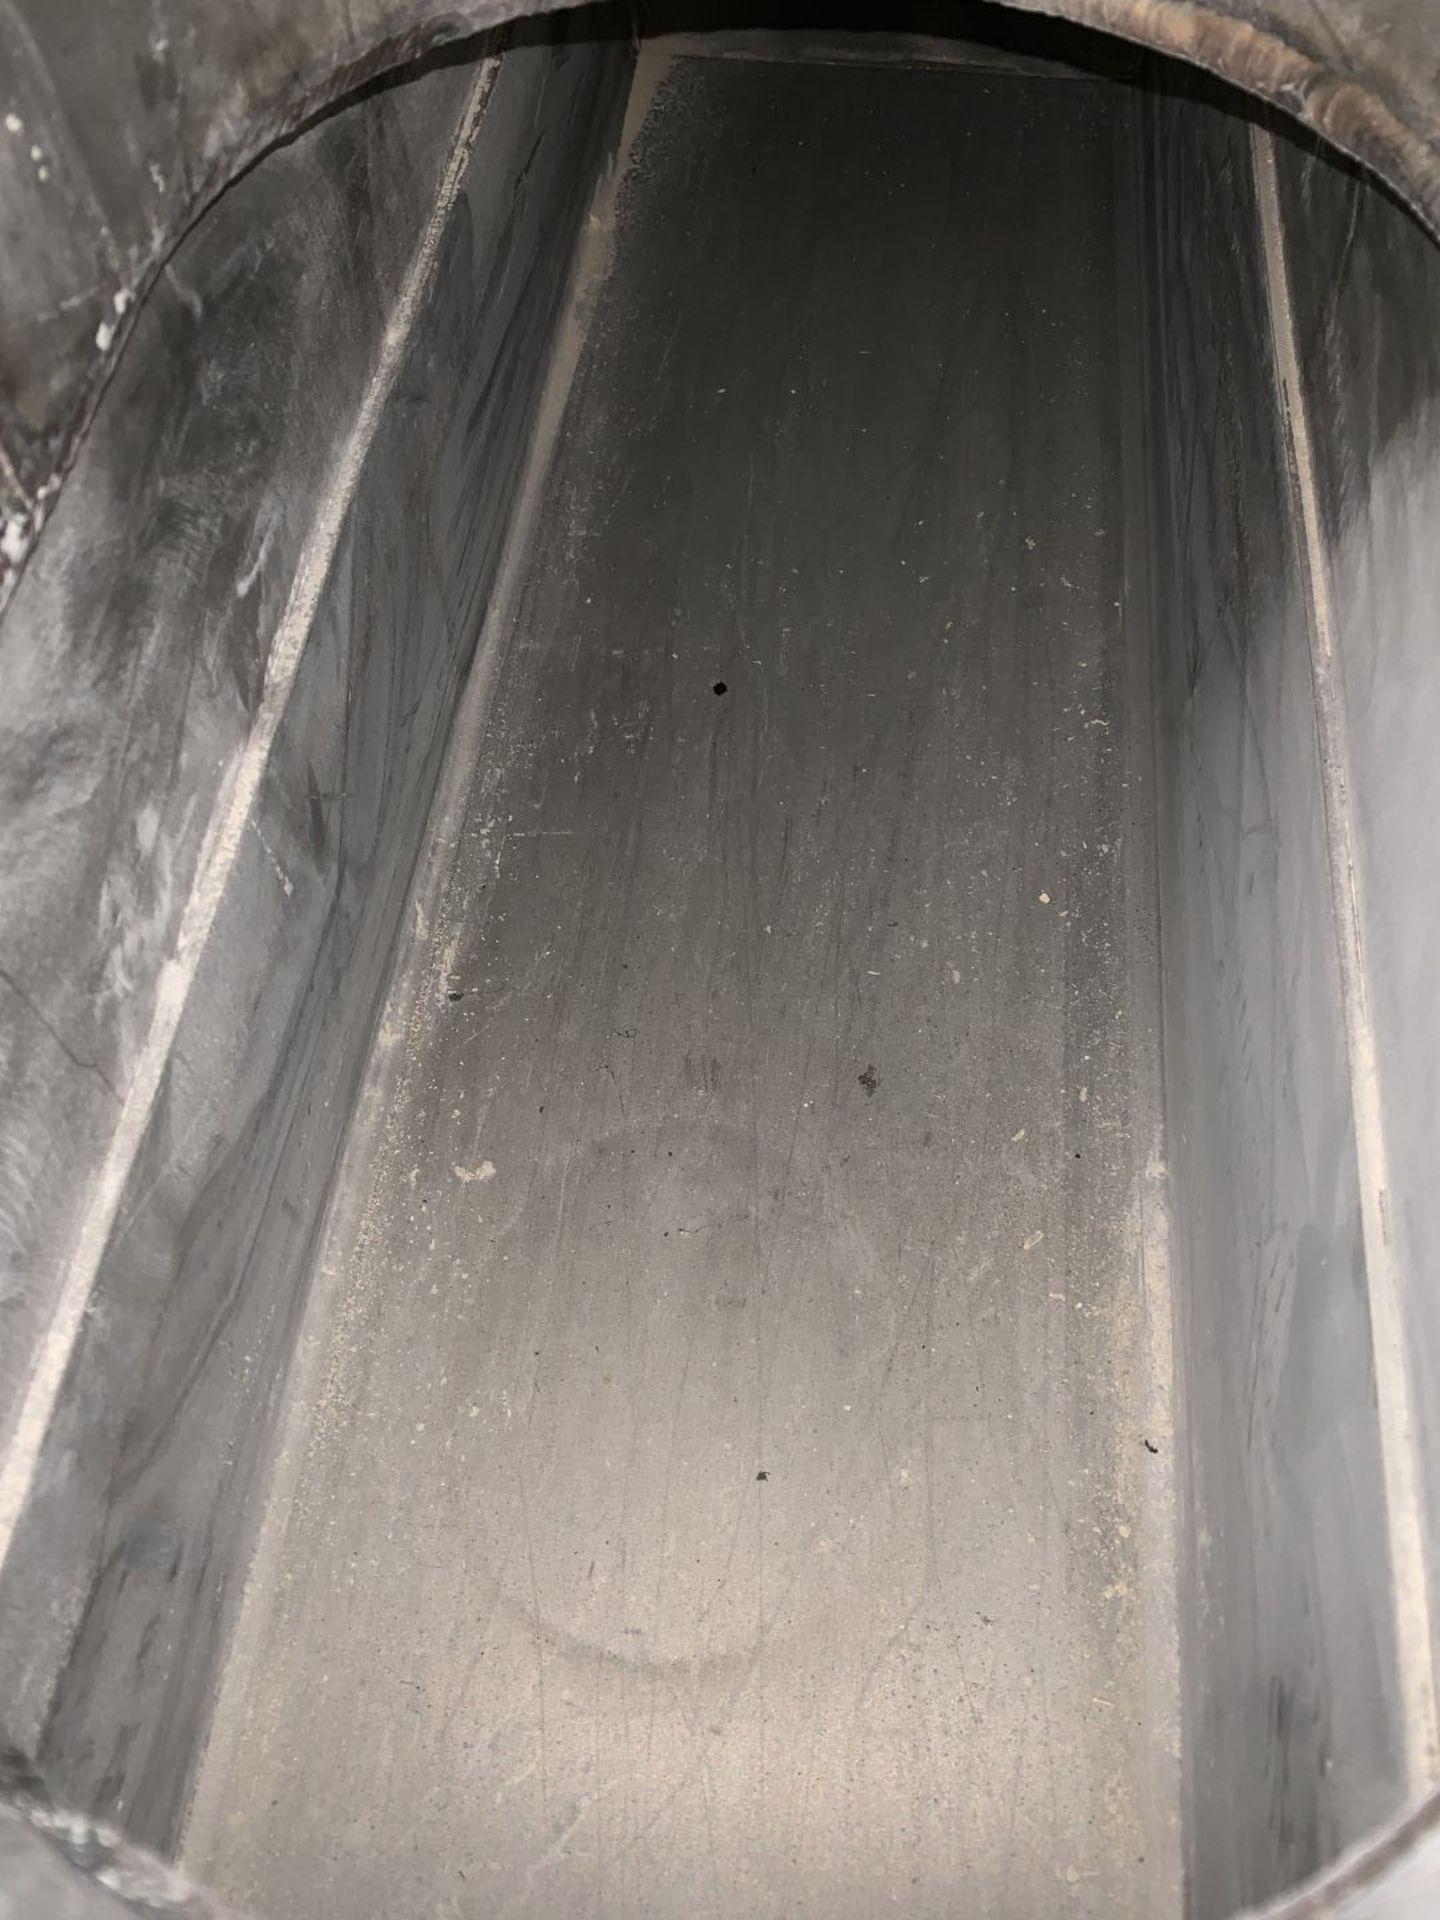 Lot 43 - Triple/S Dynamic Slipstick Conveyor, Model HDC